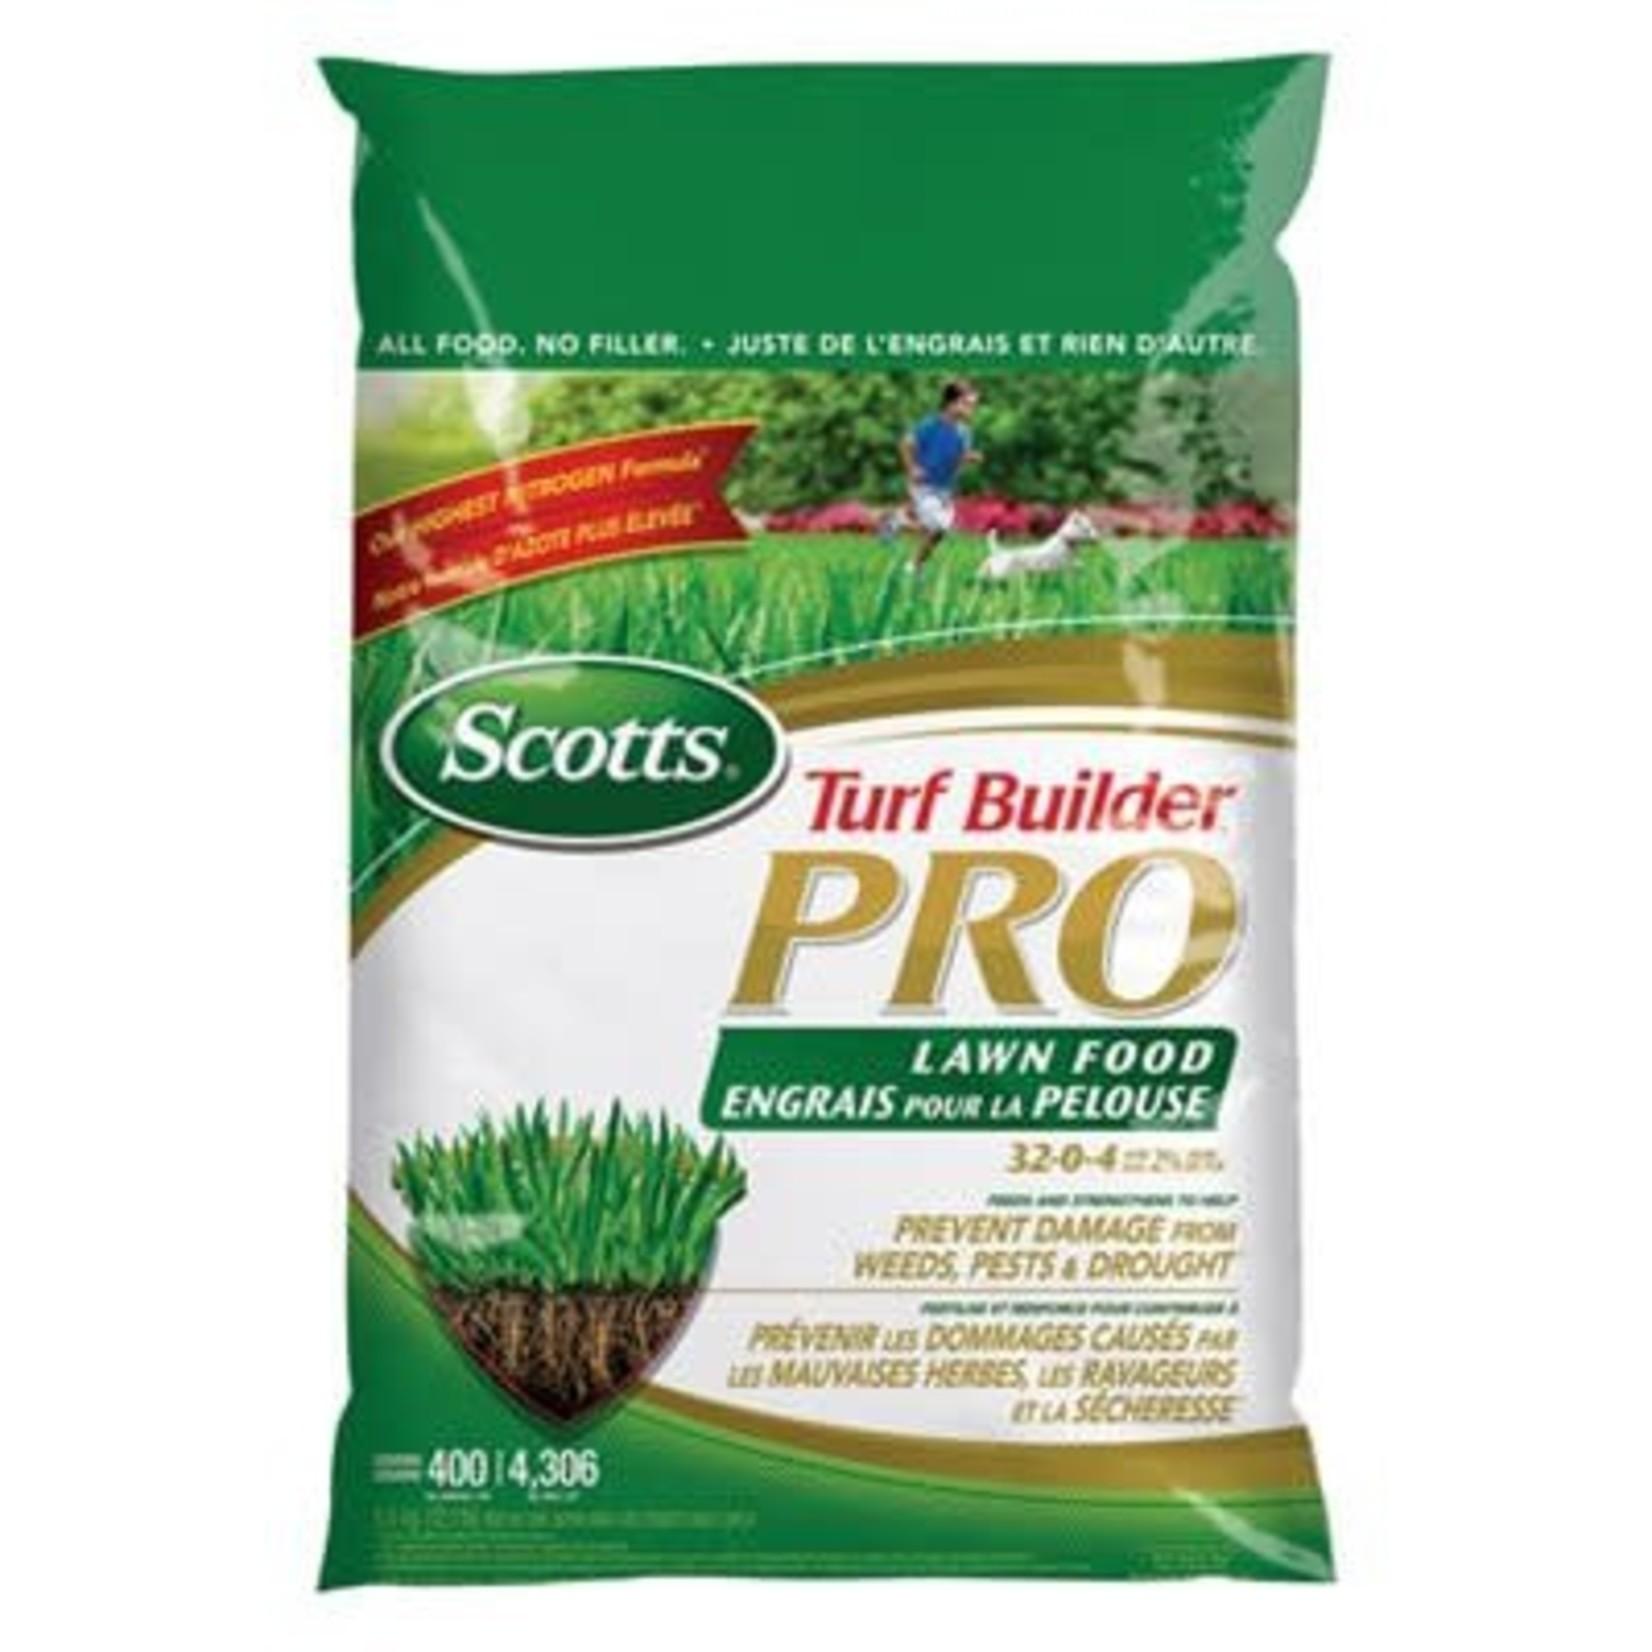 Scotts Turf Builder Pro 32-0-4, 10kg